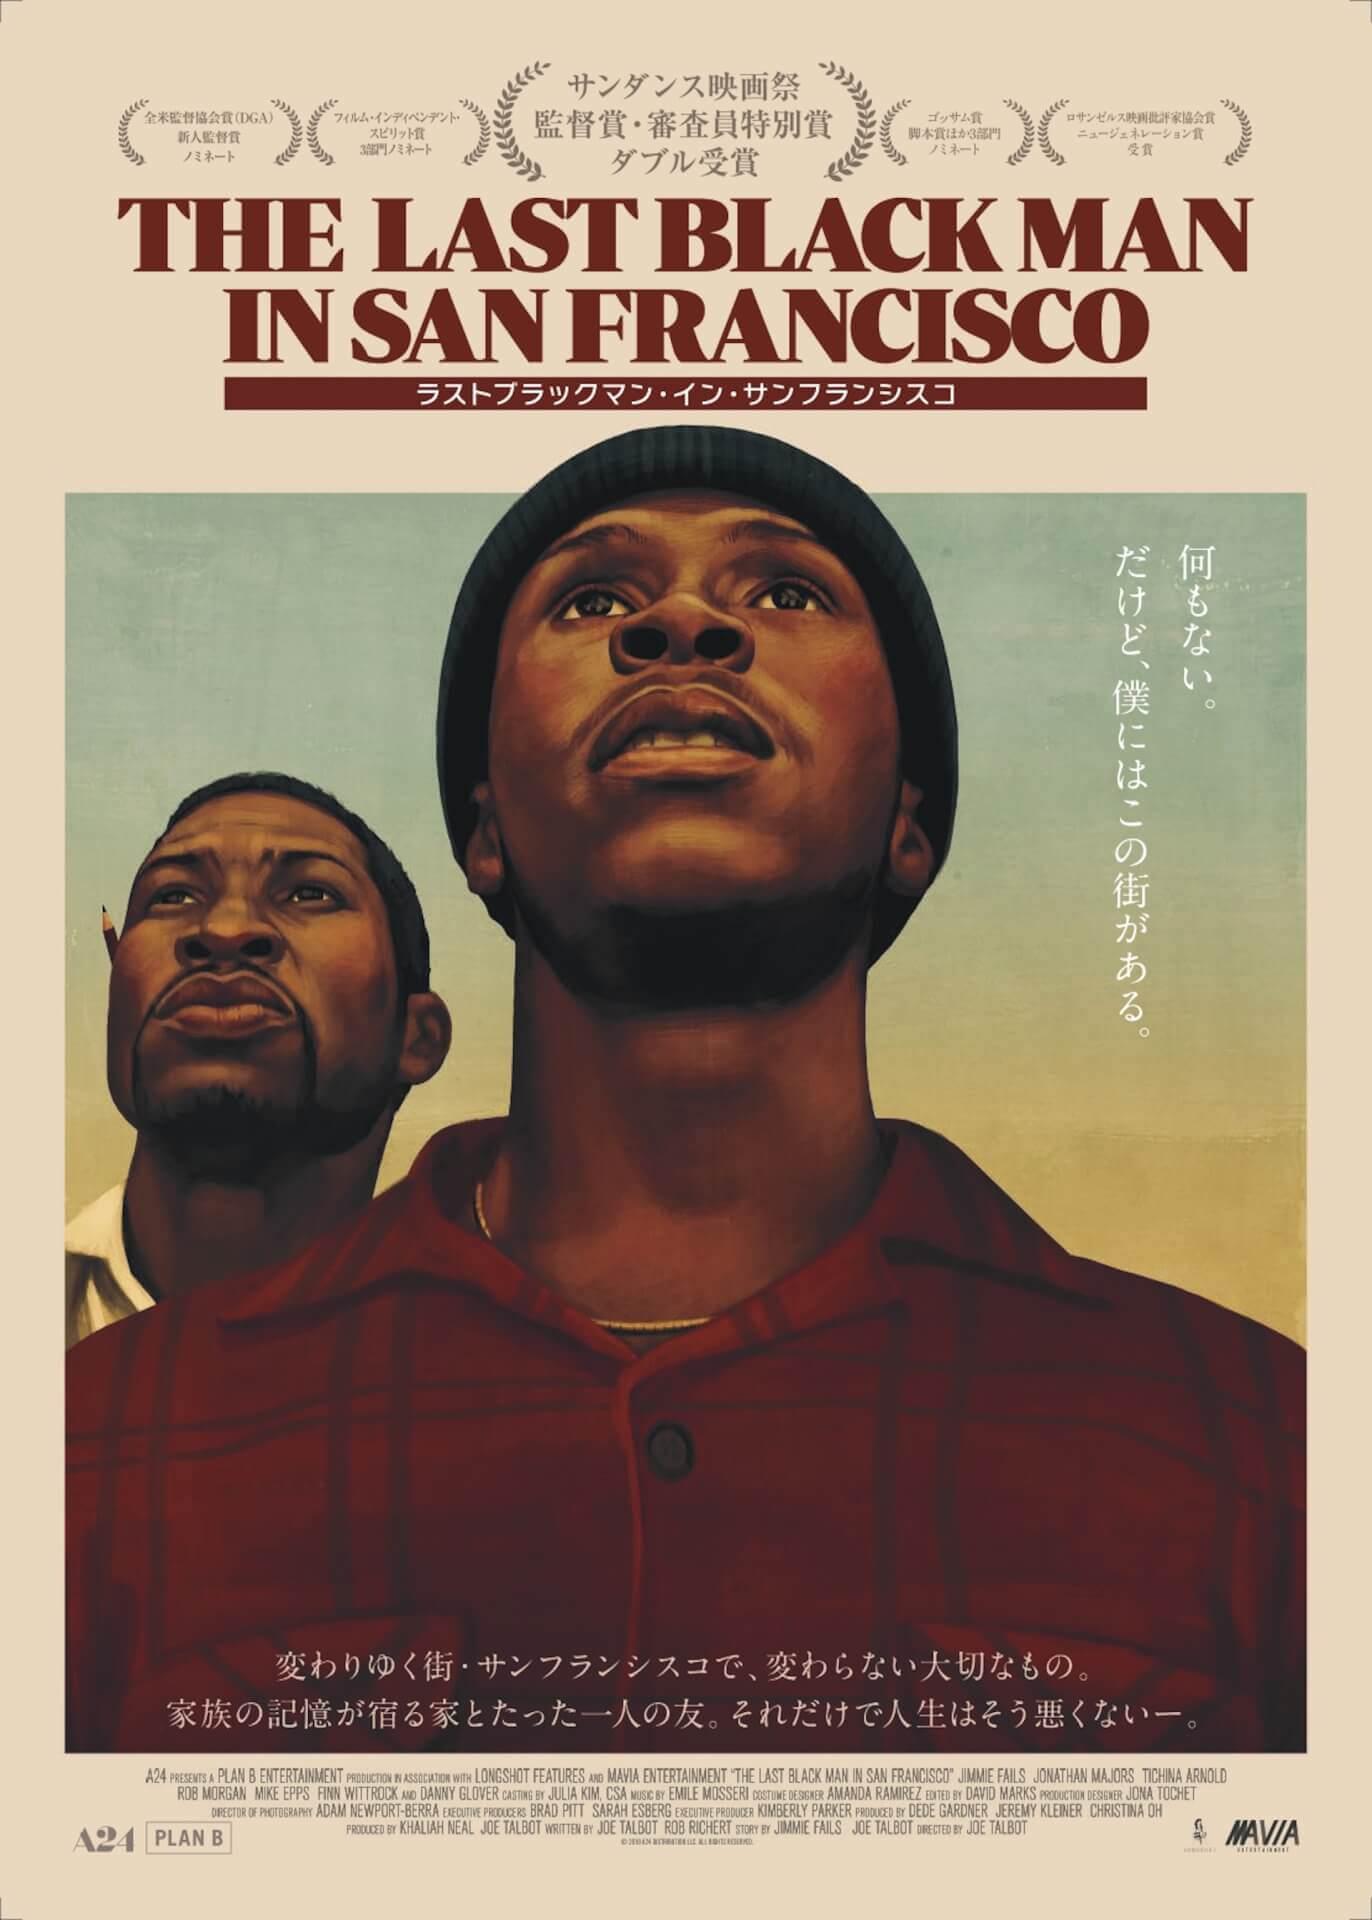 A24×プランB最新作『ラストブラックマン・イン・サンフランシスコ』のスタッフ・キャストが語る本作の魅力とは?フューチャレット映像が解禁! film2020826-lastblackman1